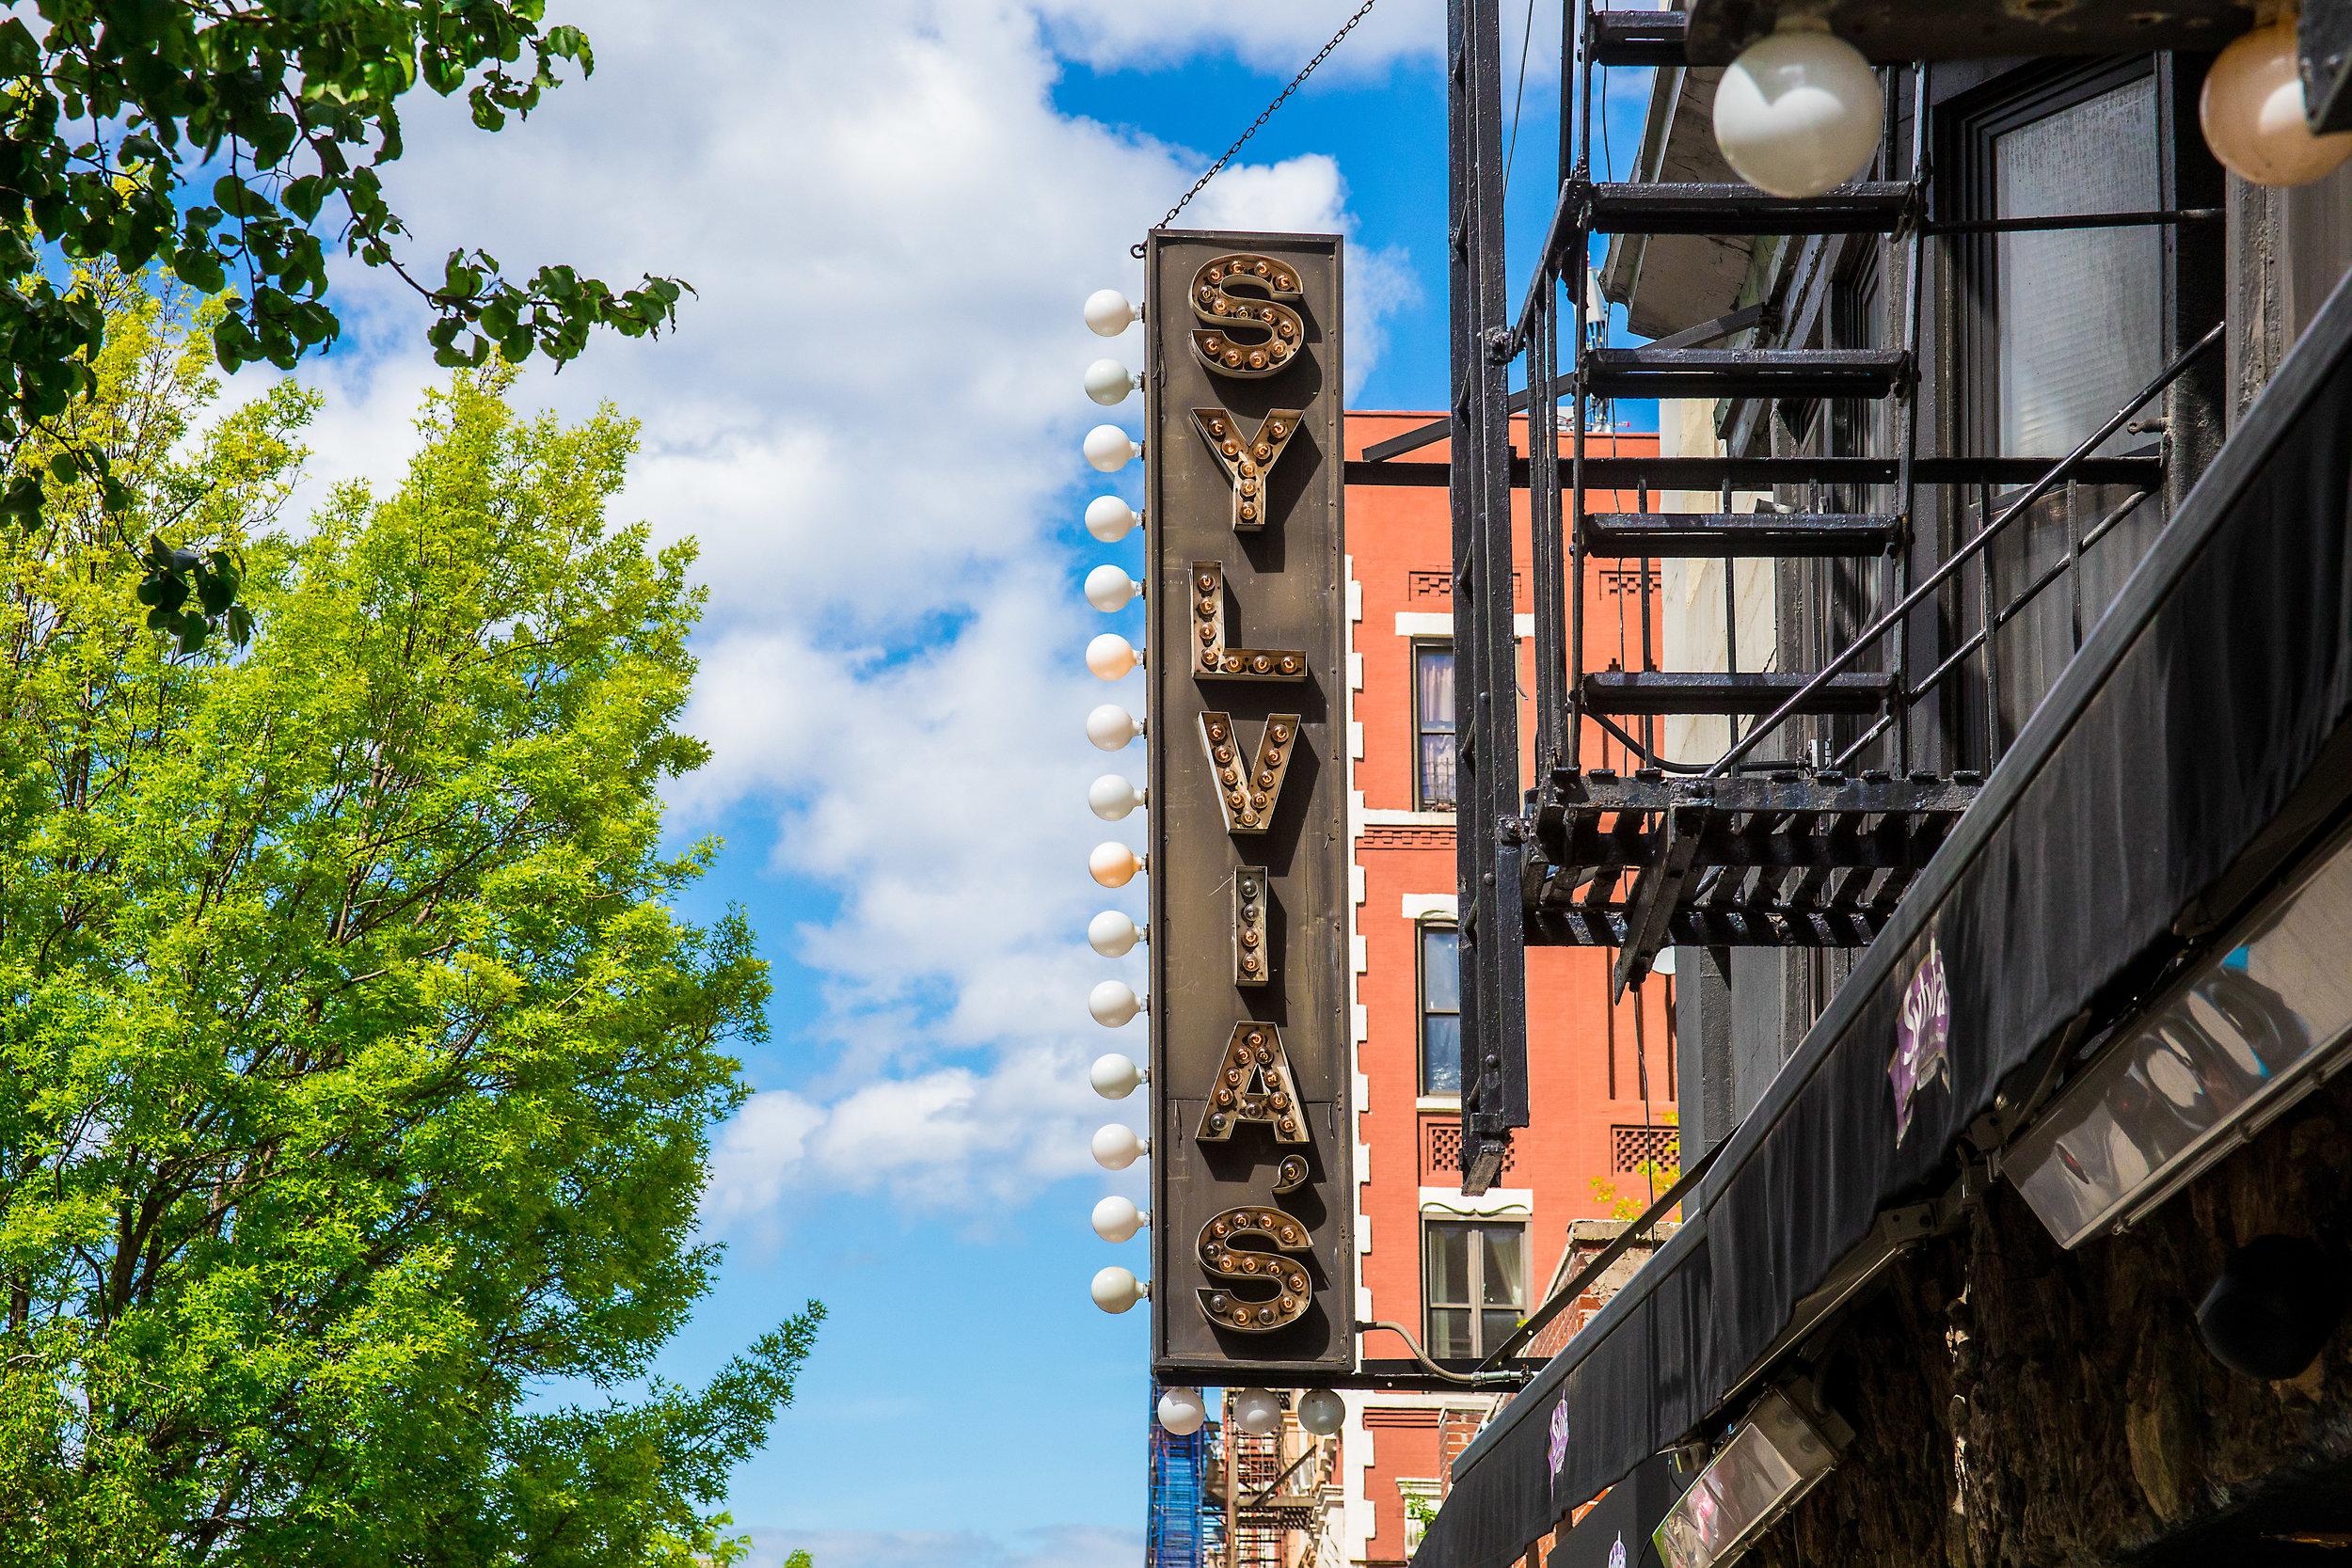 LSNY_Harlem-6.jpg